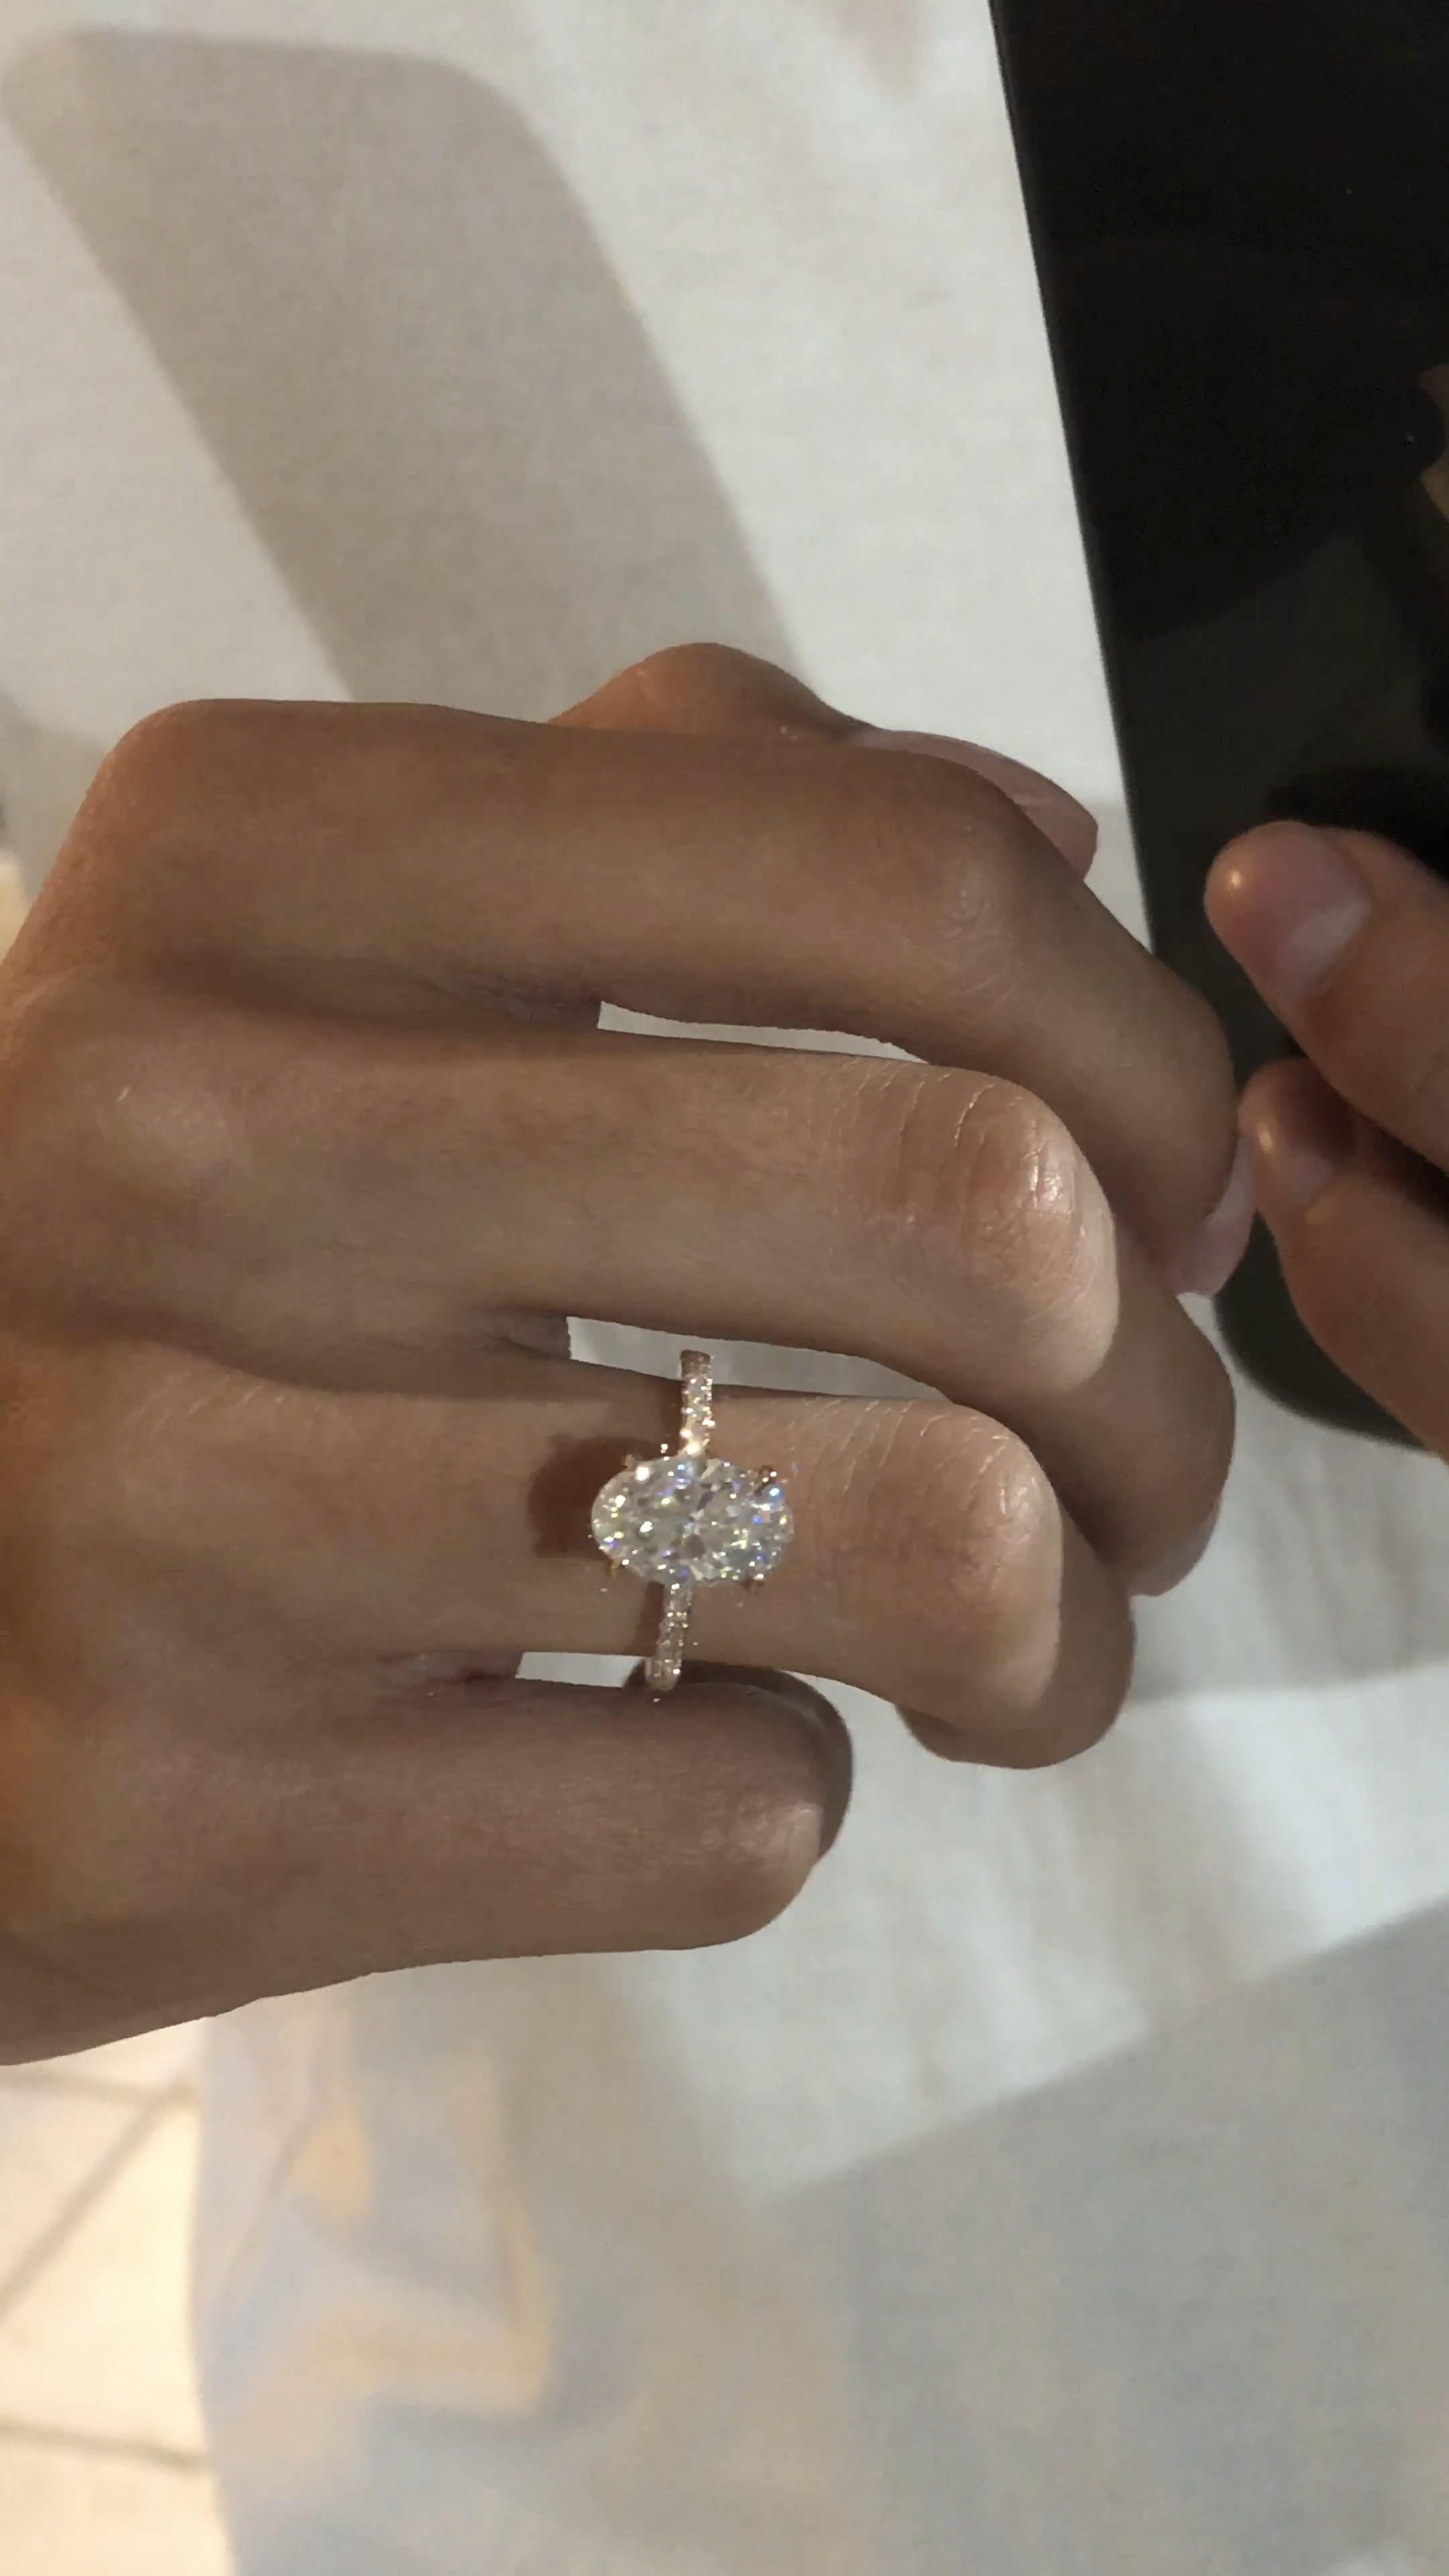 3 Carat Elongated Oval Diamond Hidden Halo Engagement Ring Rose Gold